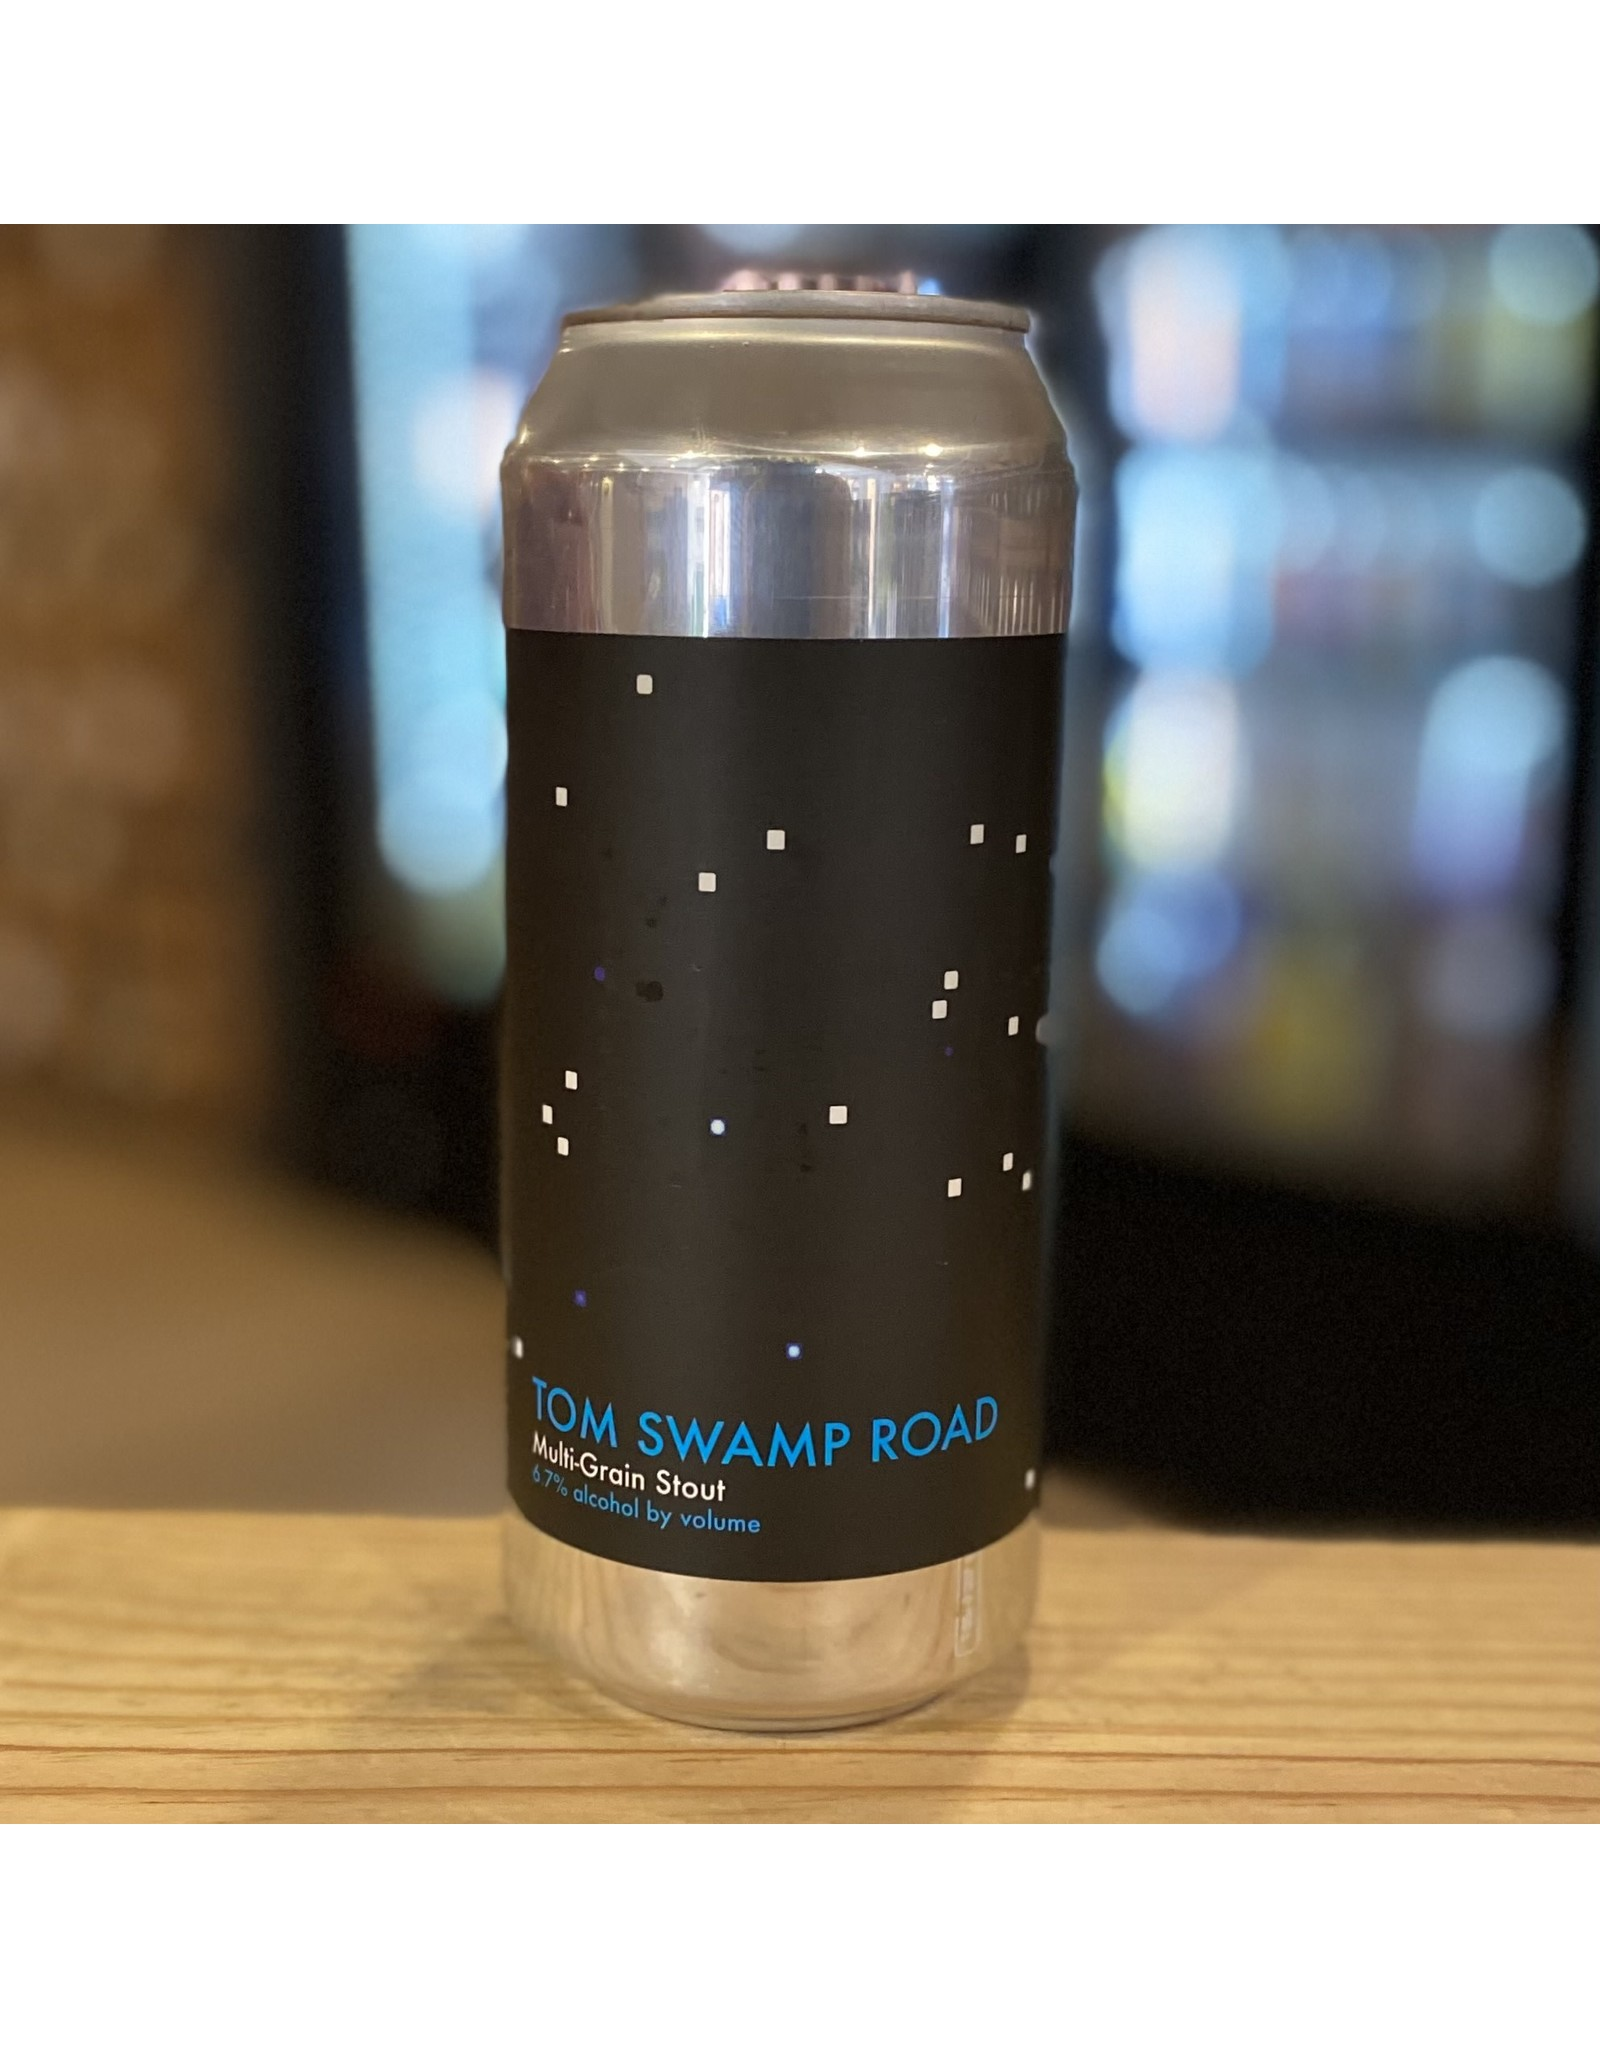 "Stout Honest Weight Artisan Beer ""Tom Swamp Road"" Multi-Grain Stout - Orange, MA"